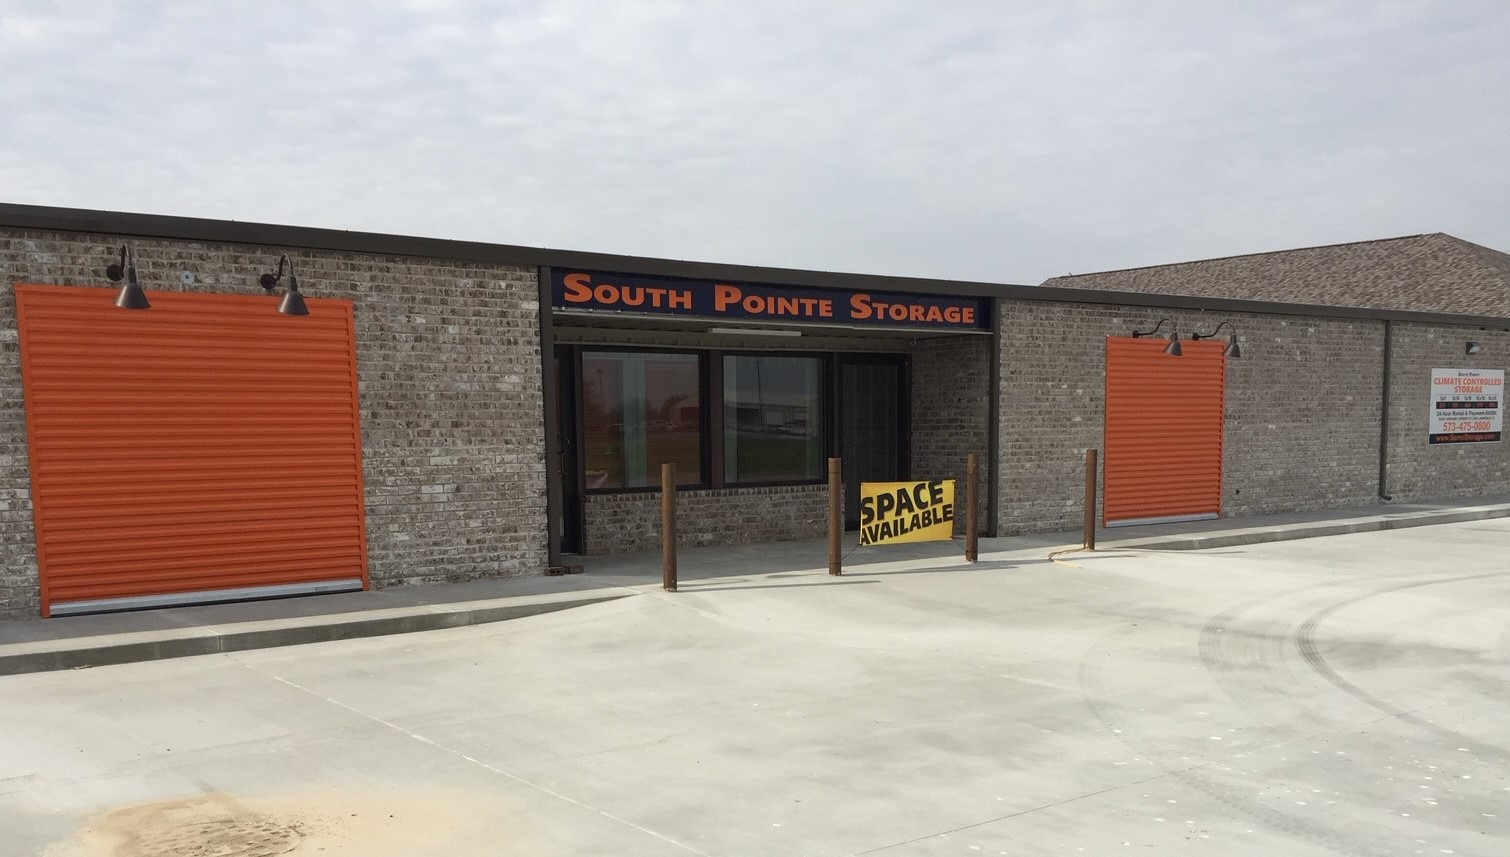 South Pointe Storage MO